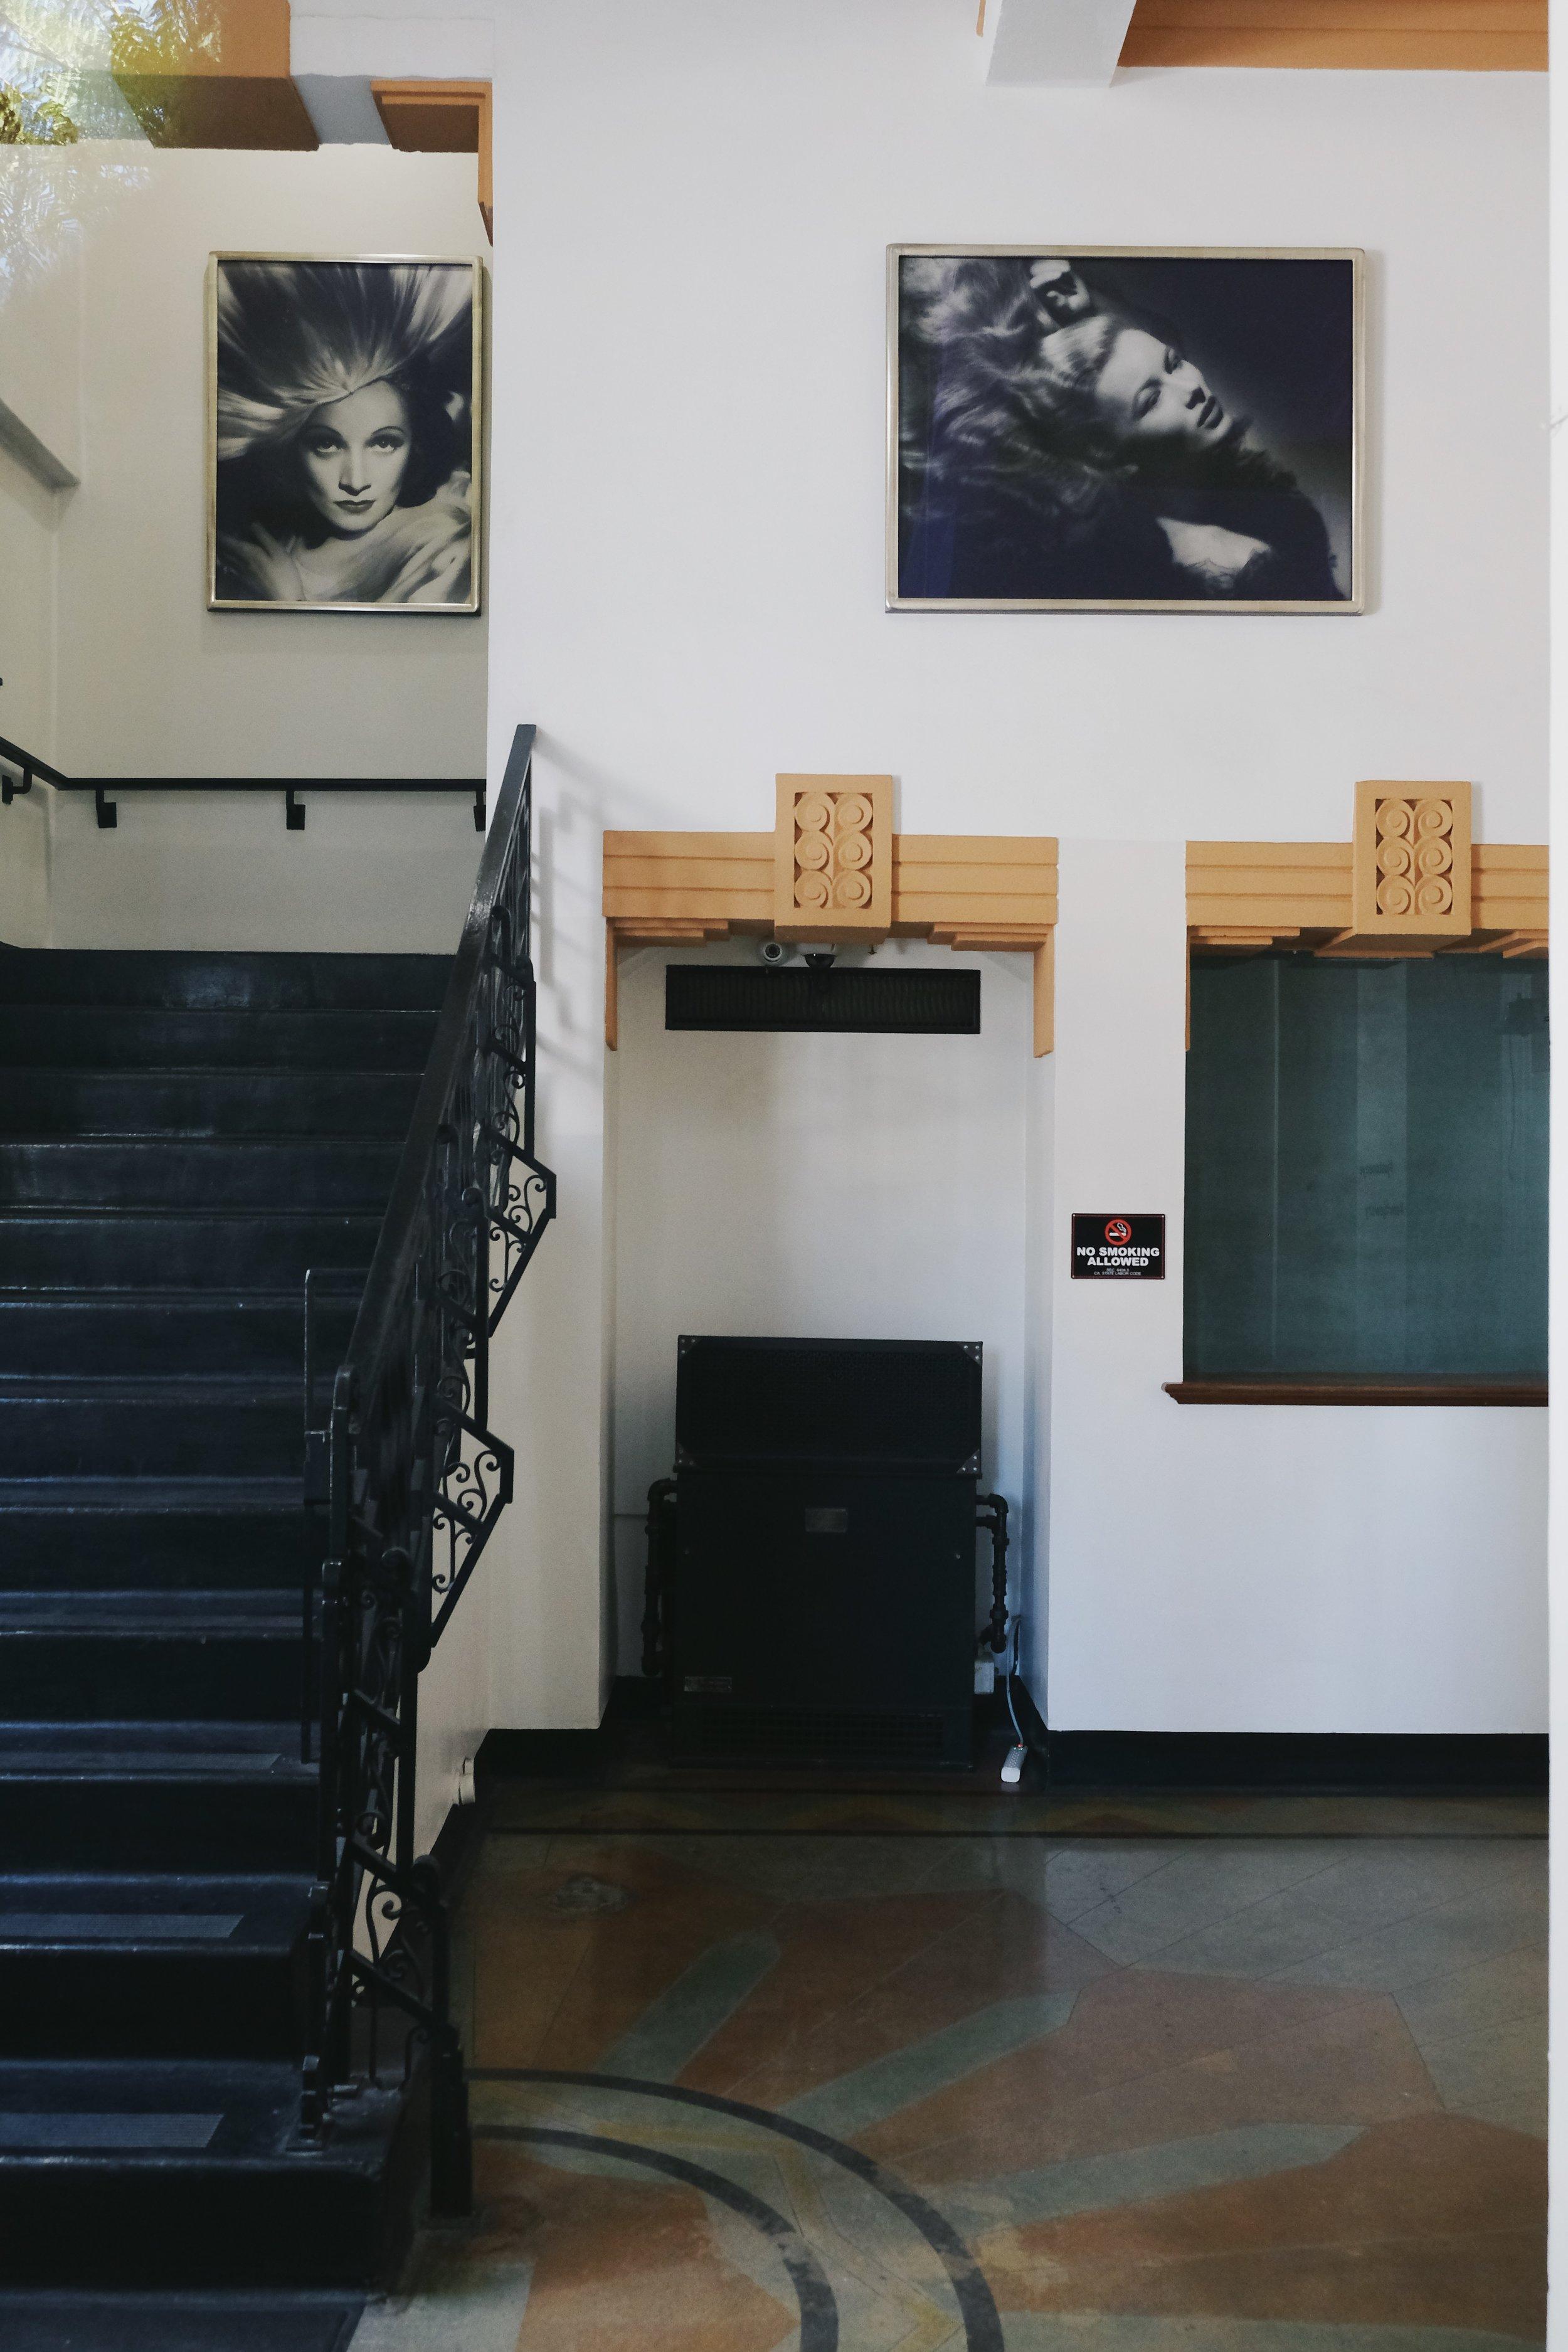 Howard-Hughes-HQ-7000-Romaine-2019-10